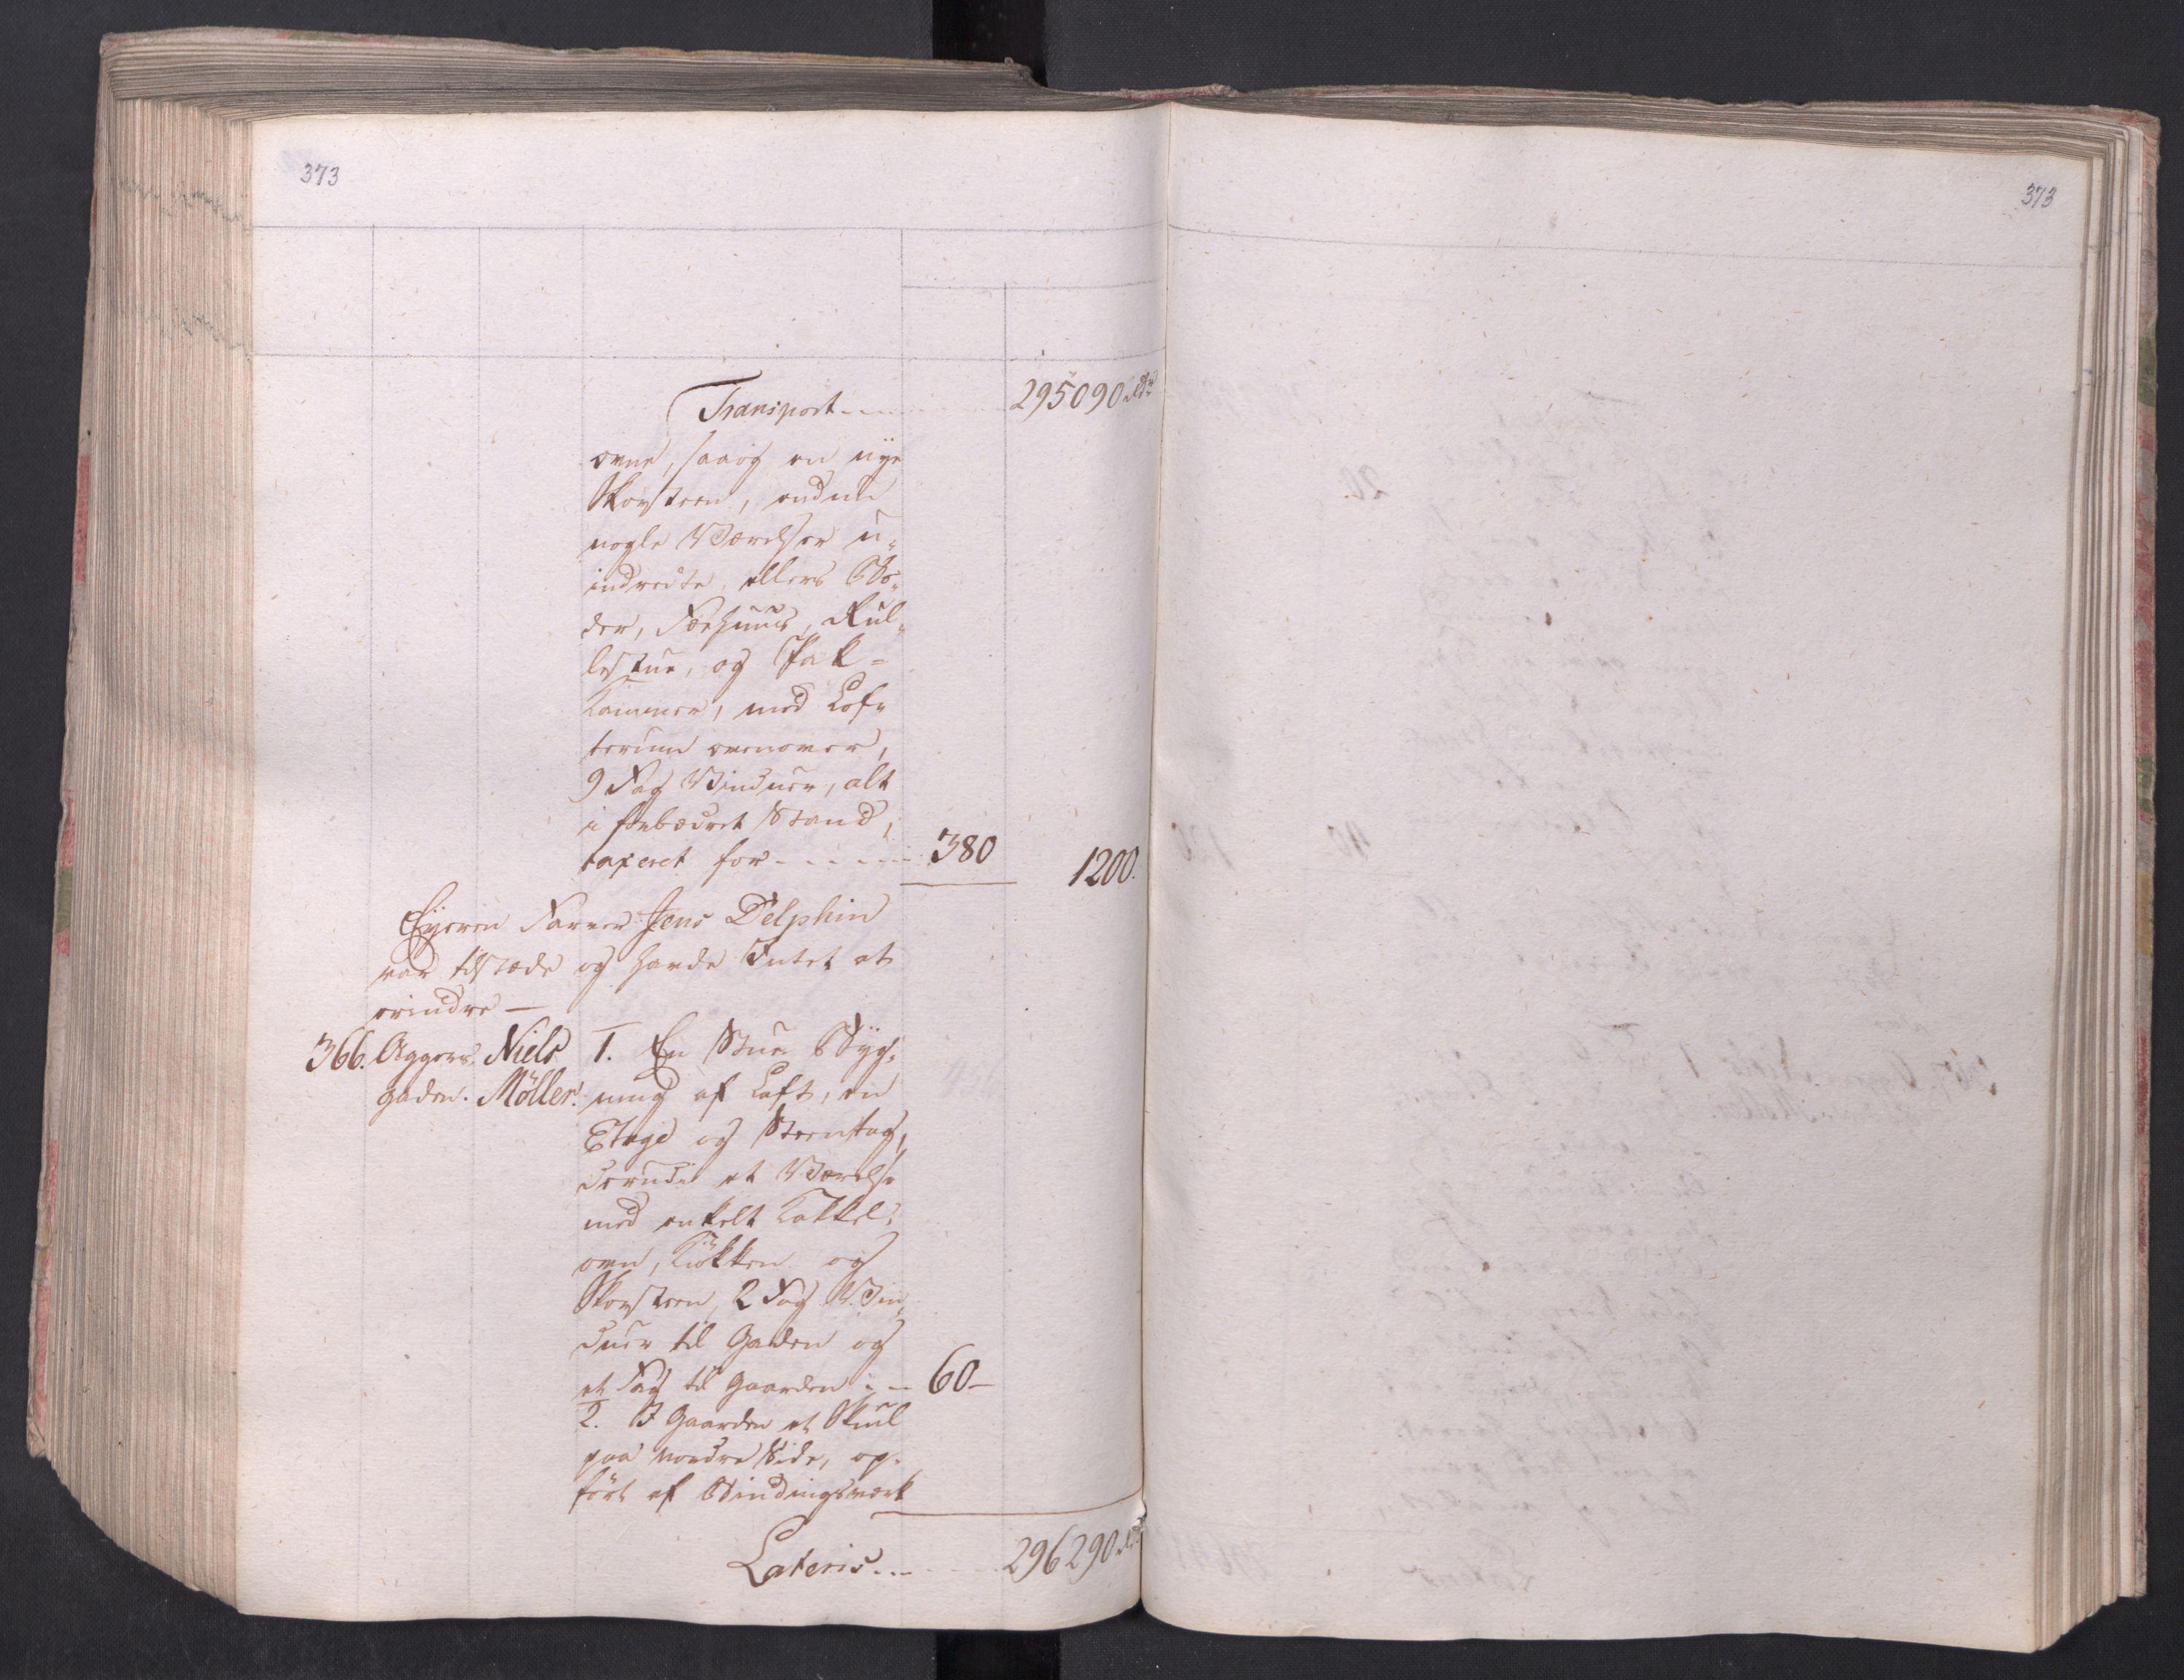 SAO, Kristiania stiftamt, I/Ia/L0015: Branntakster, 1797, s. 373